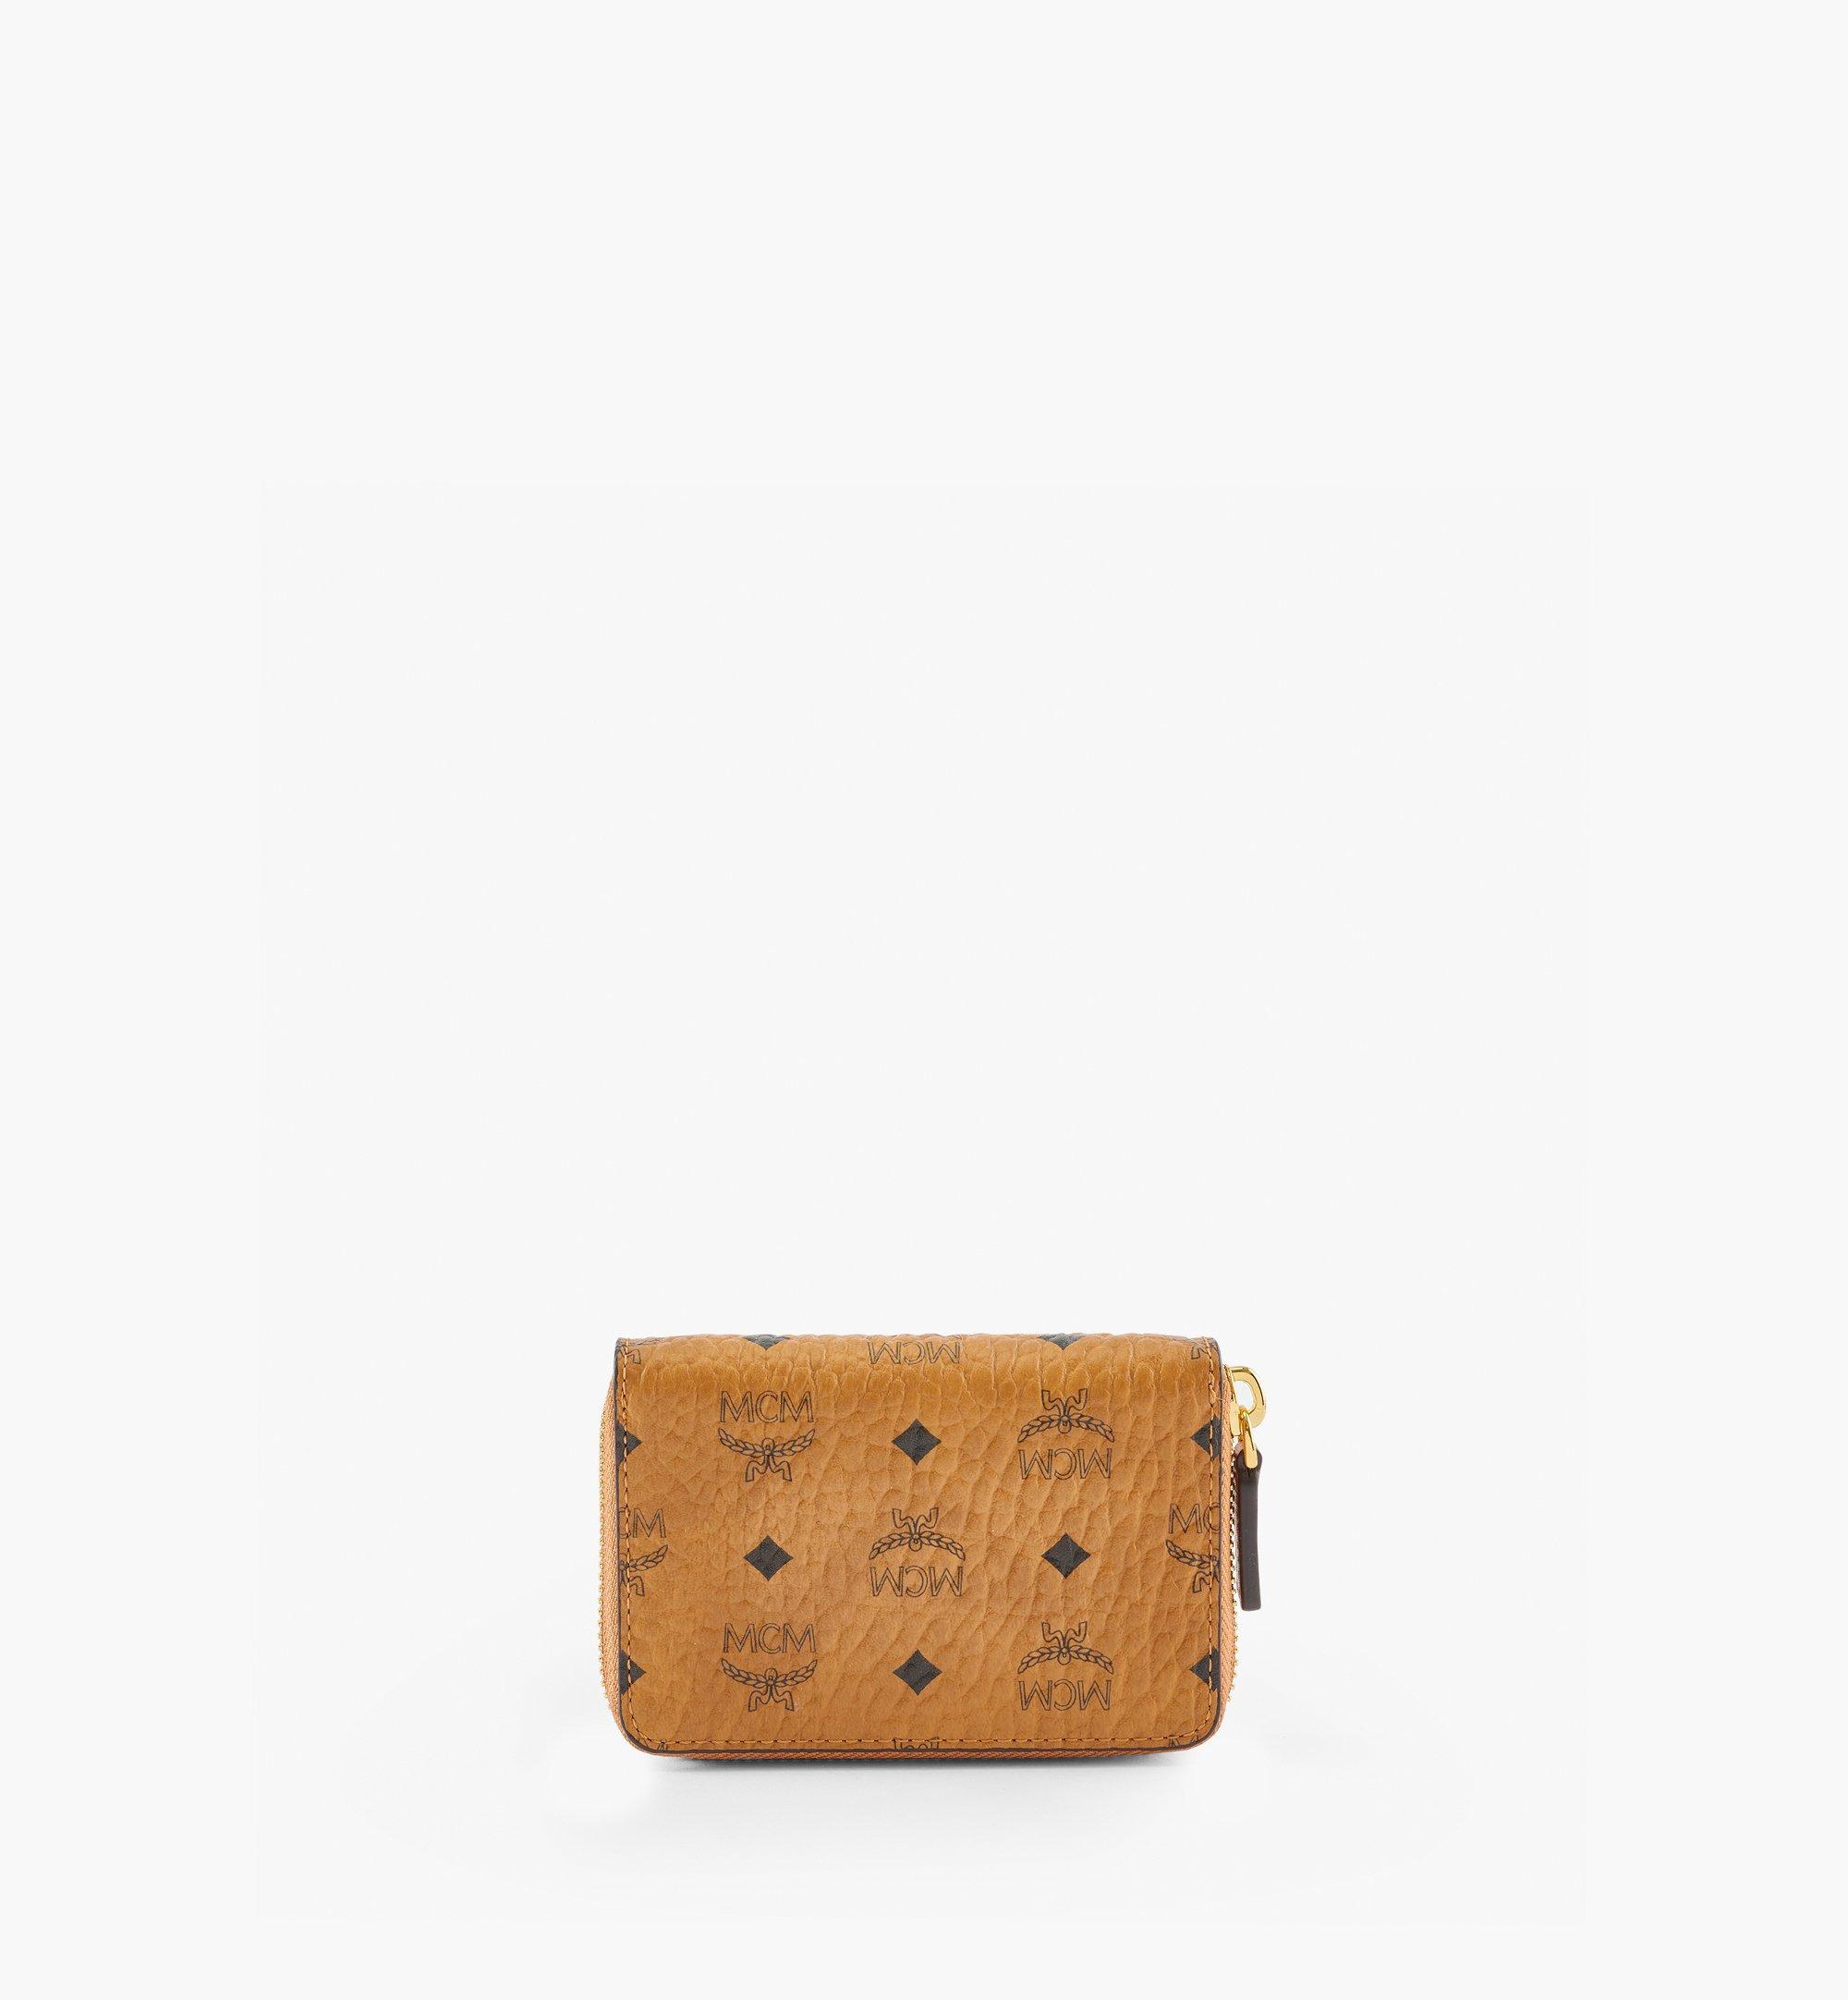 MCM MCM x Aka Boku Zip Card Wallet in Visetos Original Cognac MXLBAUP01CO001 Alternate View 2